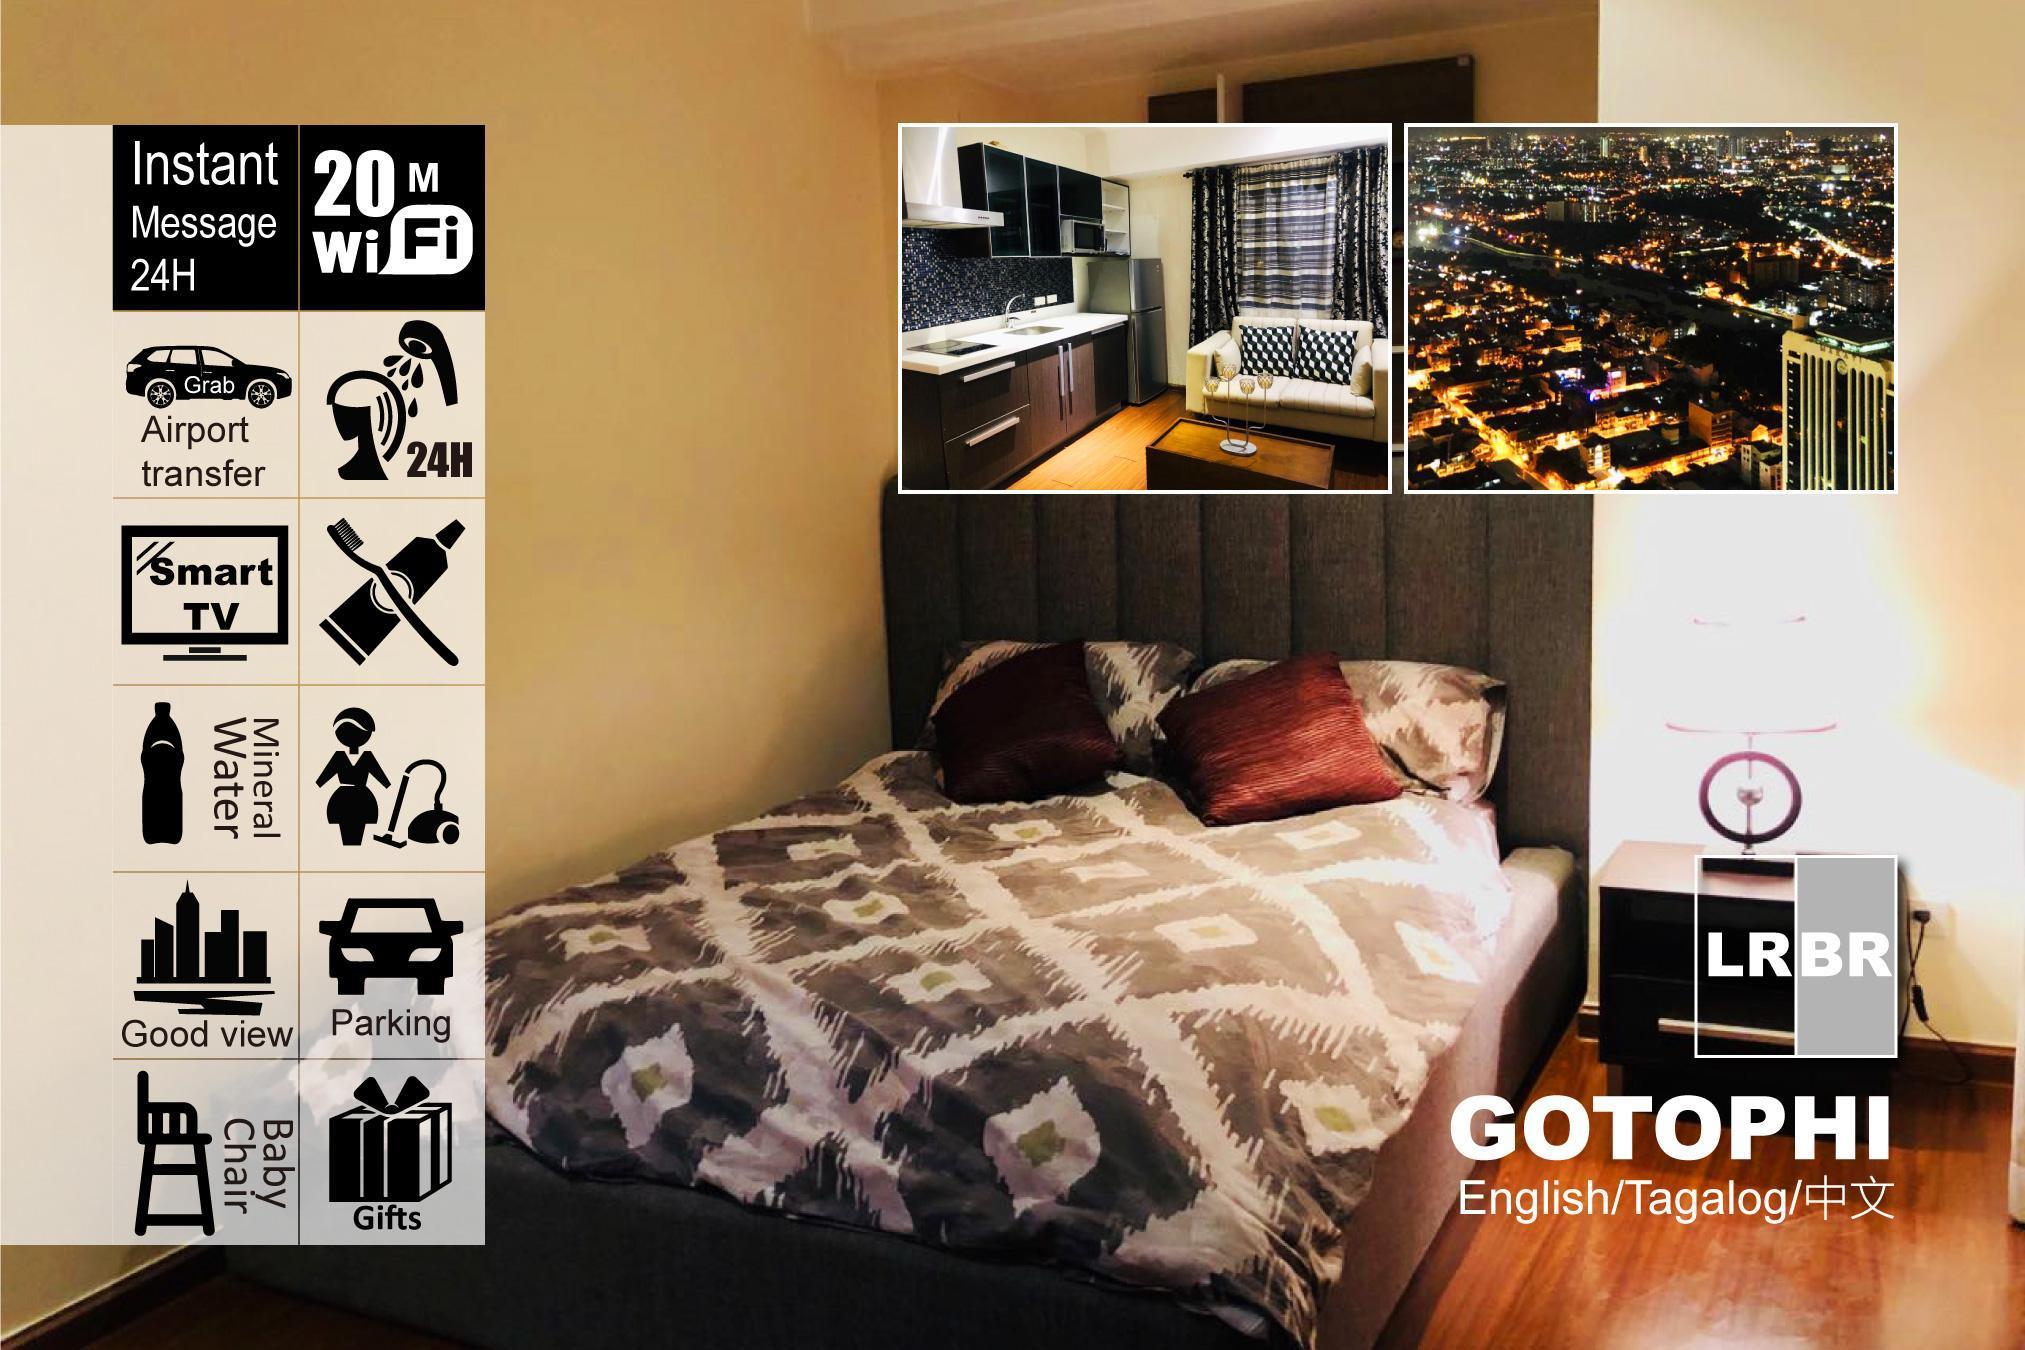 Gotophi 5Star Hotel 1BR Knightsbridge Makati 5813